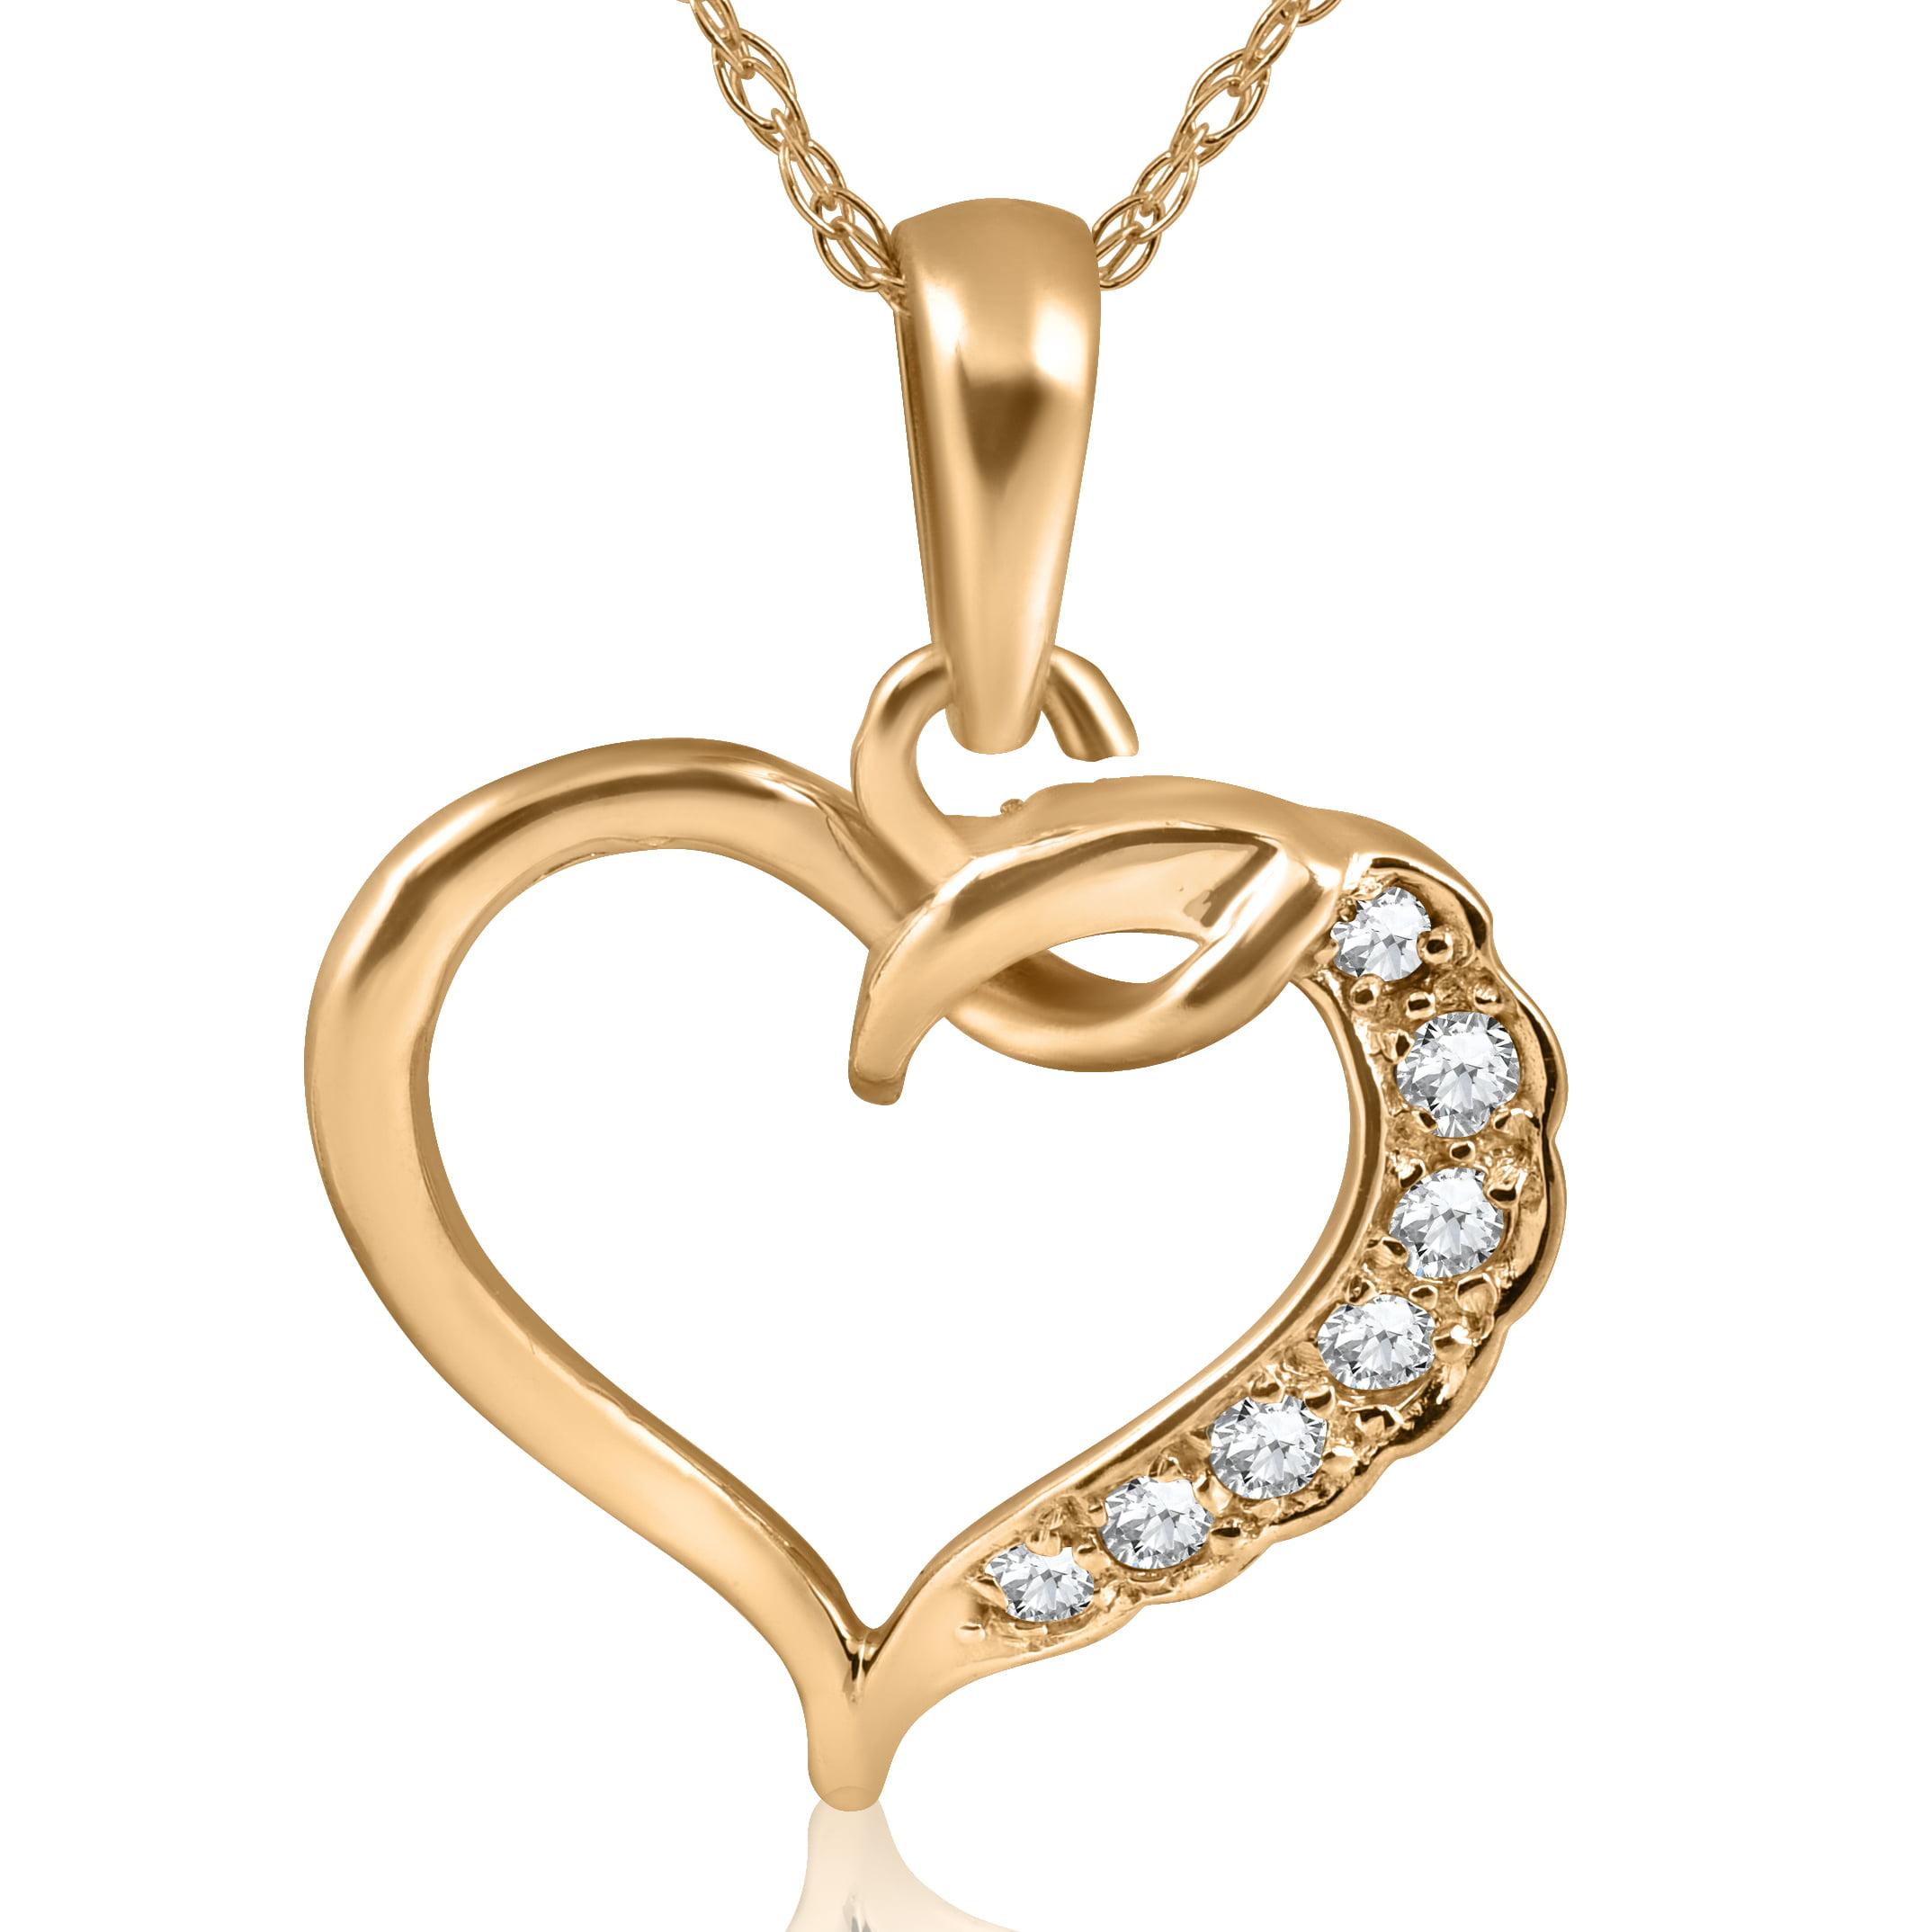 1 5ct Diamond Heart Pendant 14K Yellow Gold by Pompeii3